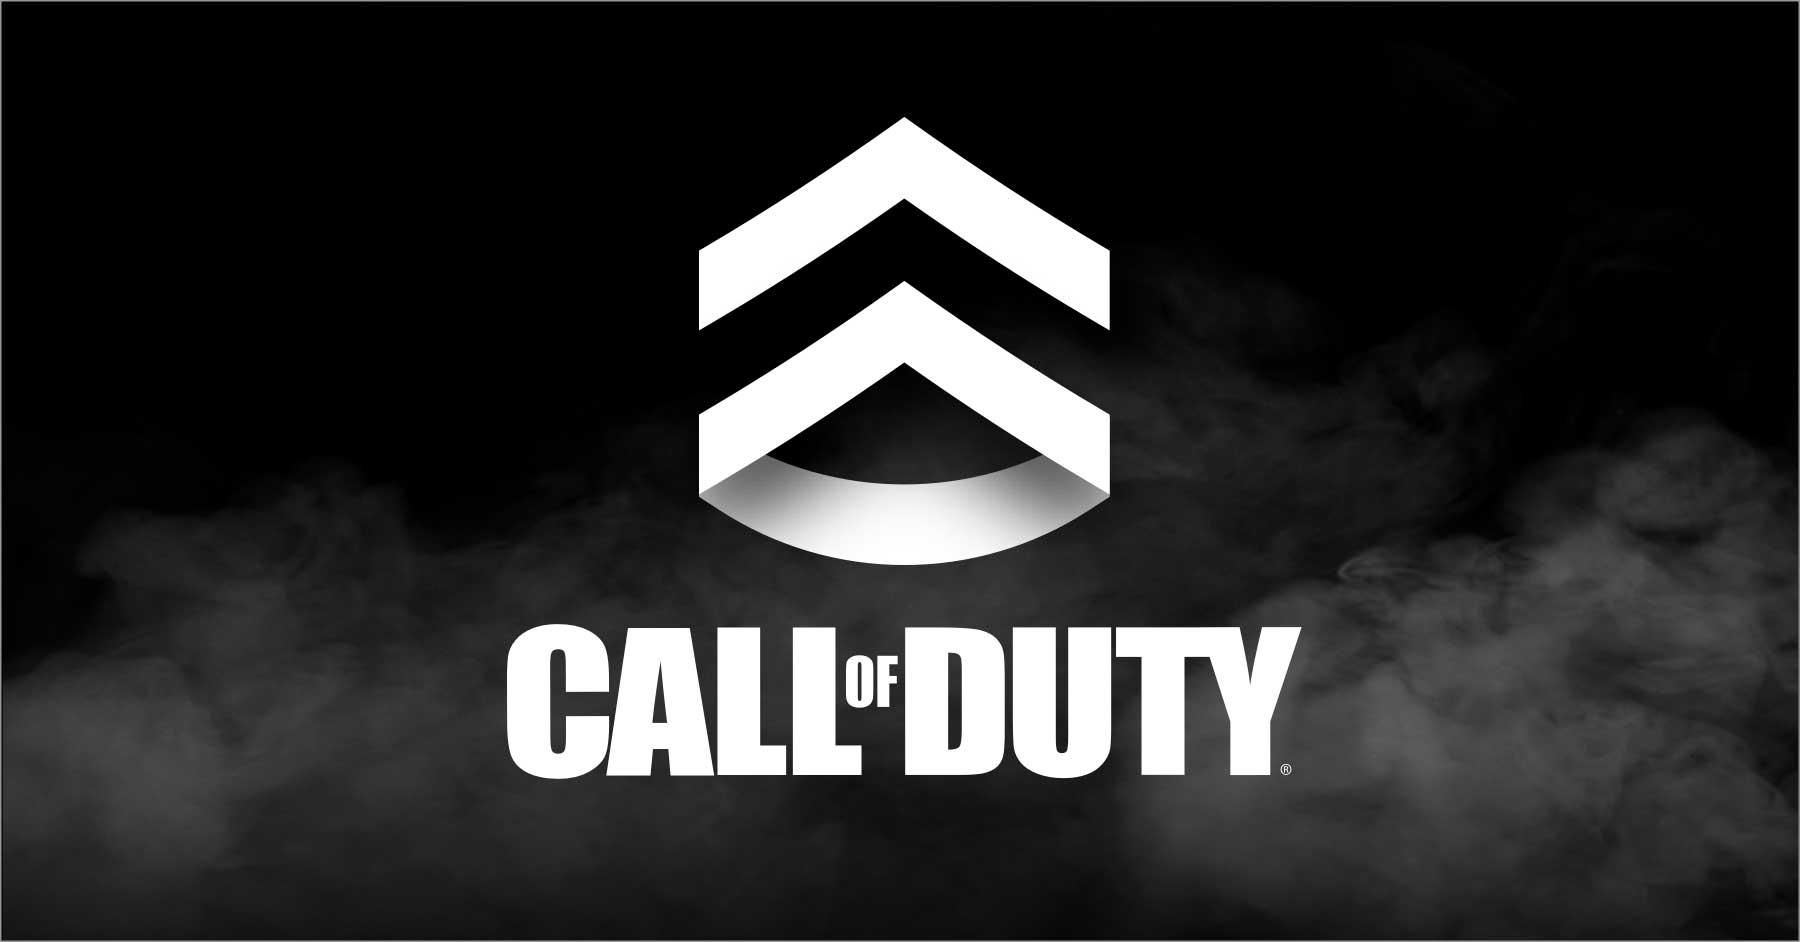 Call Of Duty Modern Warfare Logo   1800x942 Wallpaper   teahubio 1800x942